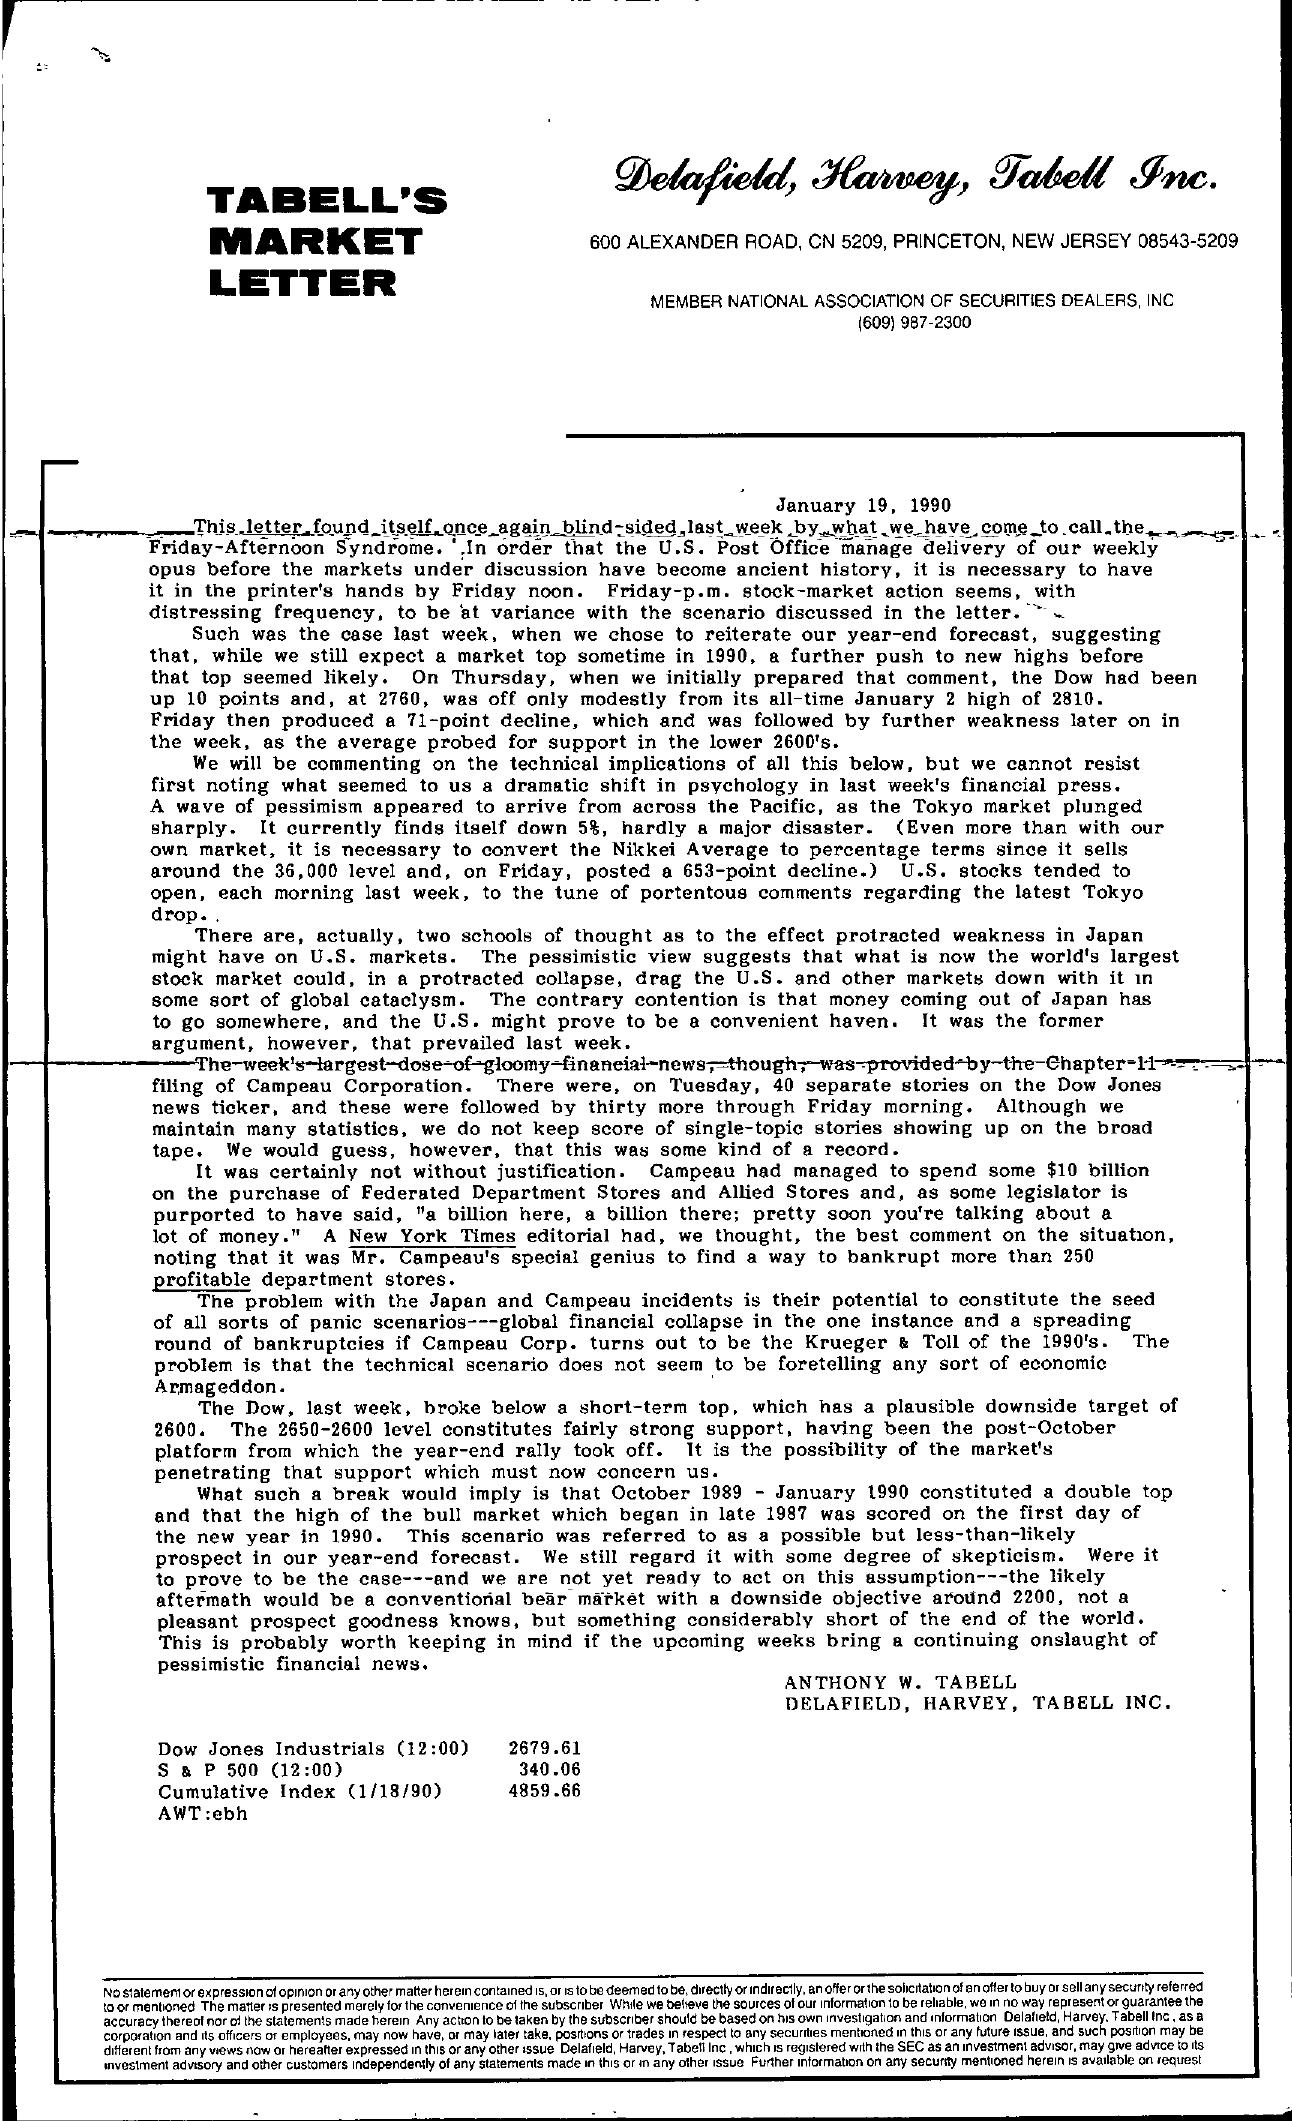 Tabell's Market Letter - January 19, 1990